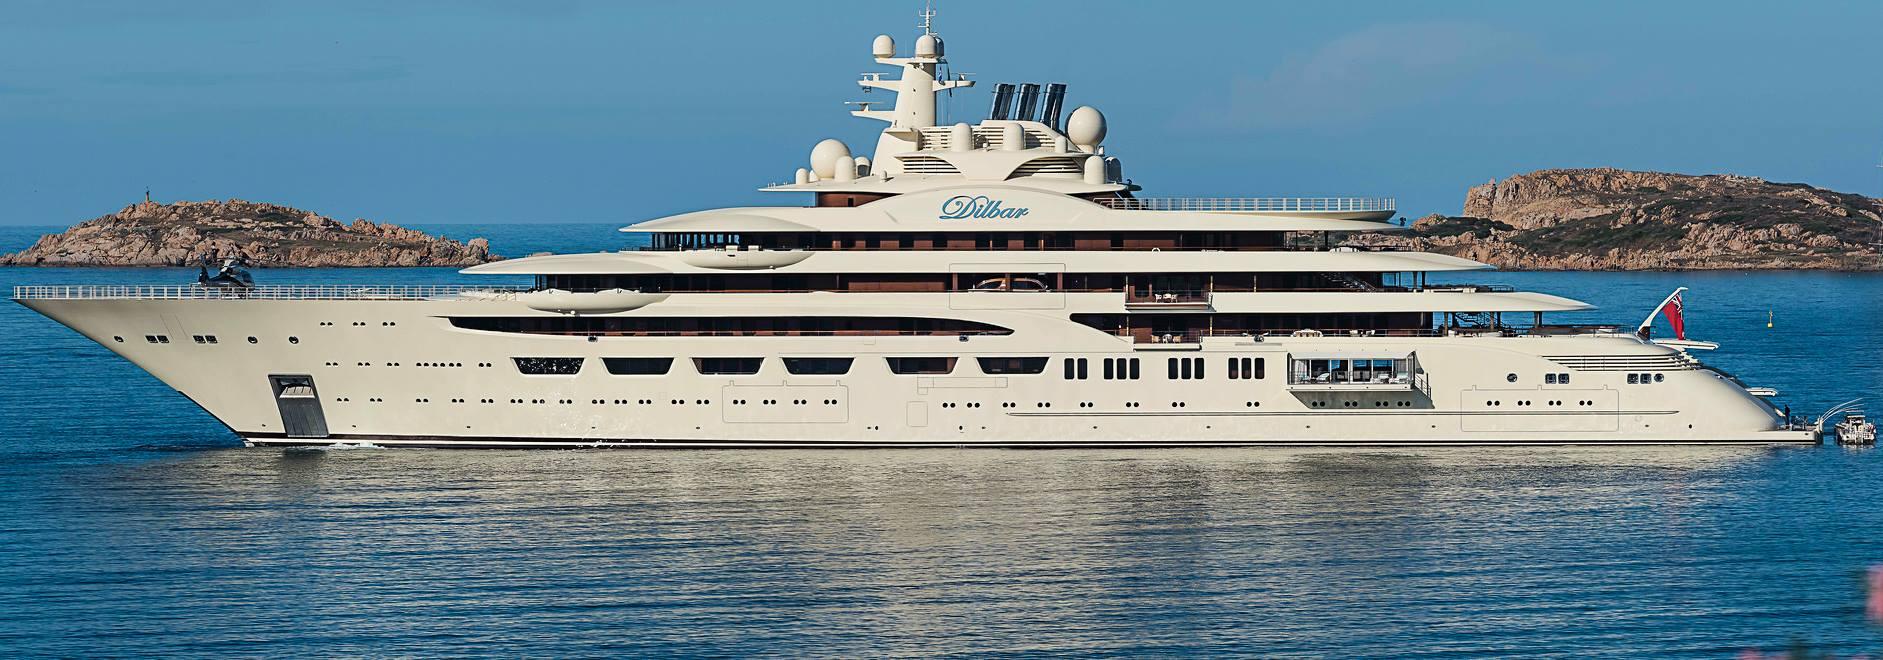 Motor Yacht Dilbar - 157m